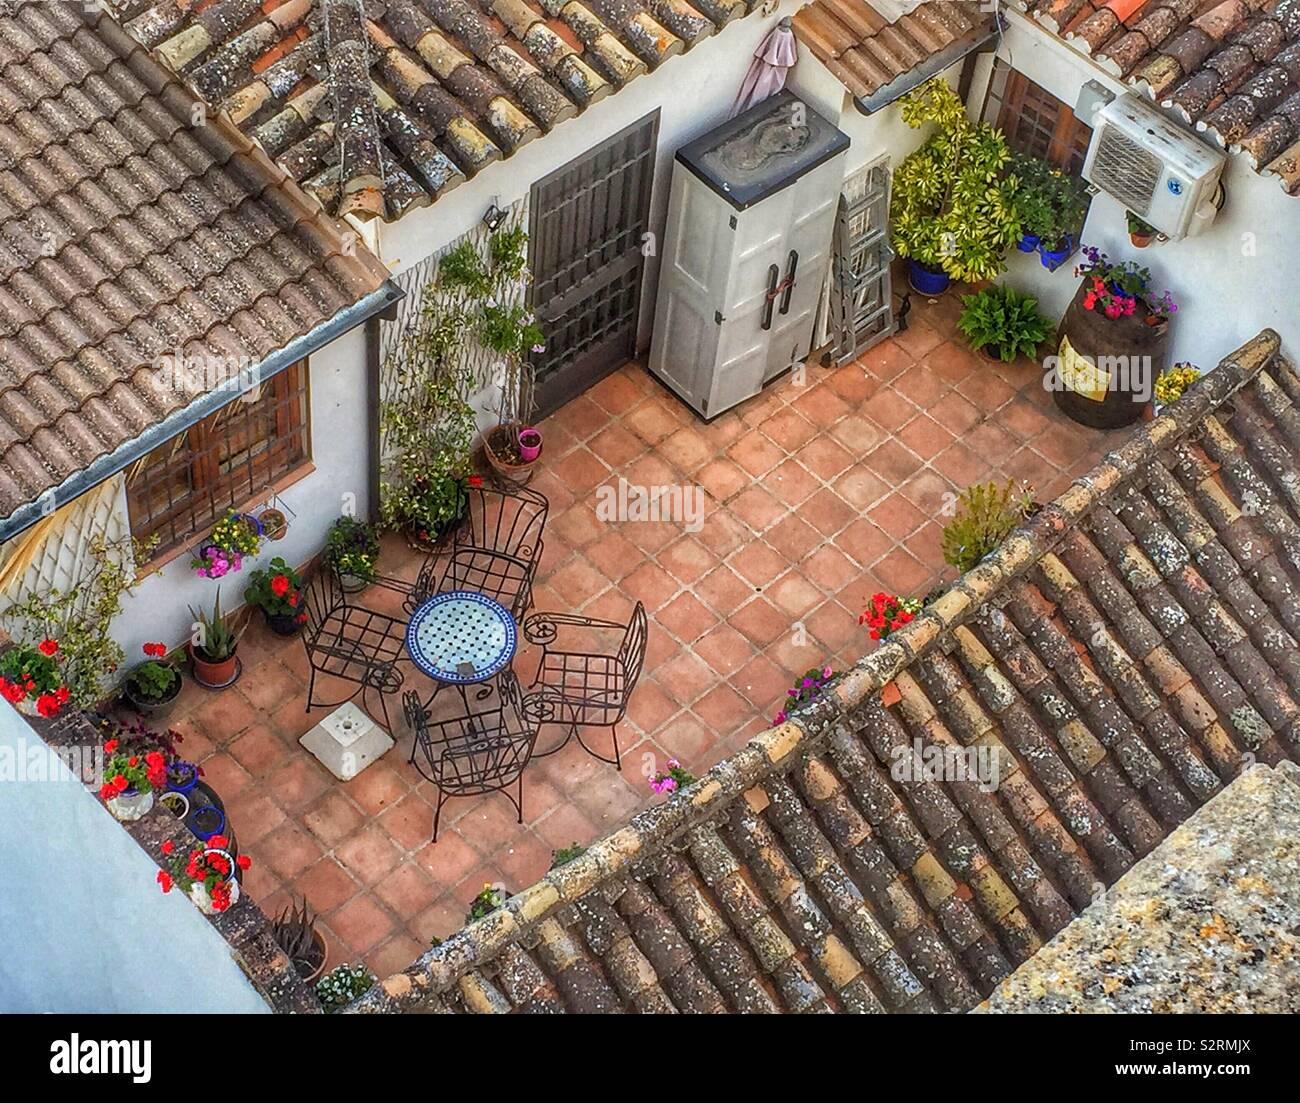 Acogedora Terraza En La Azotea De La Casa Tradicional